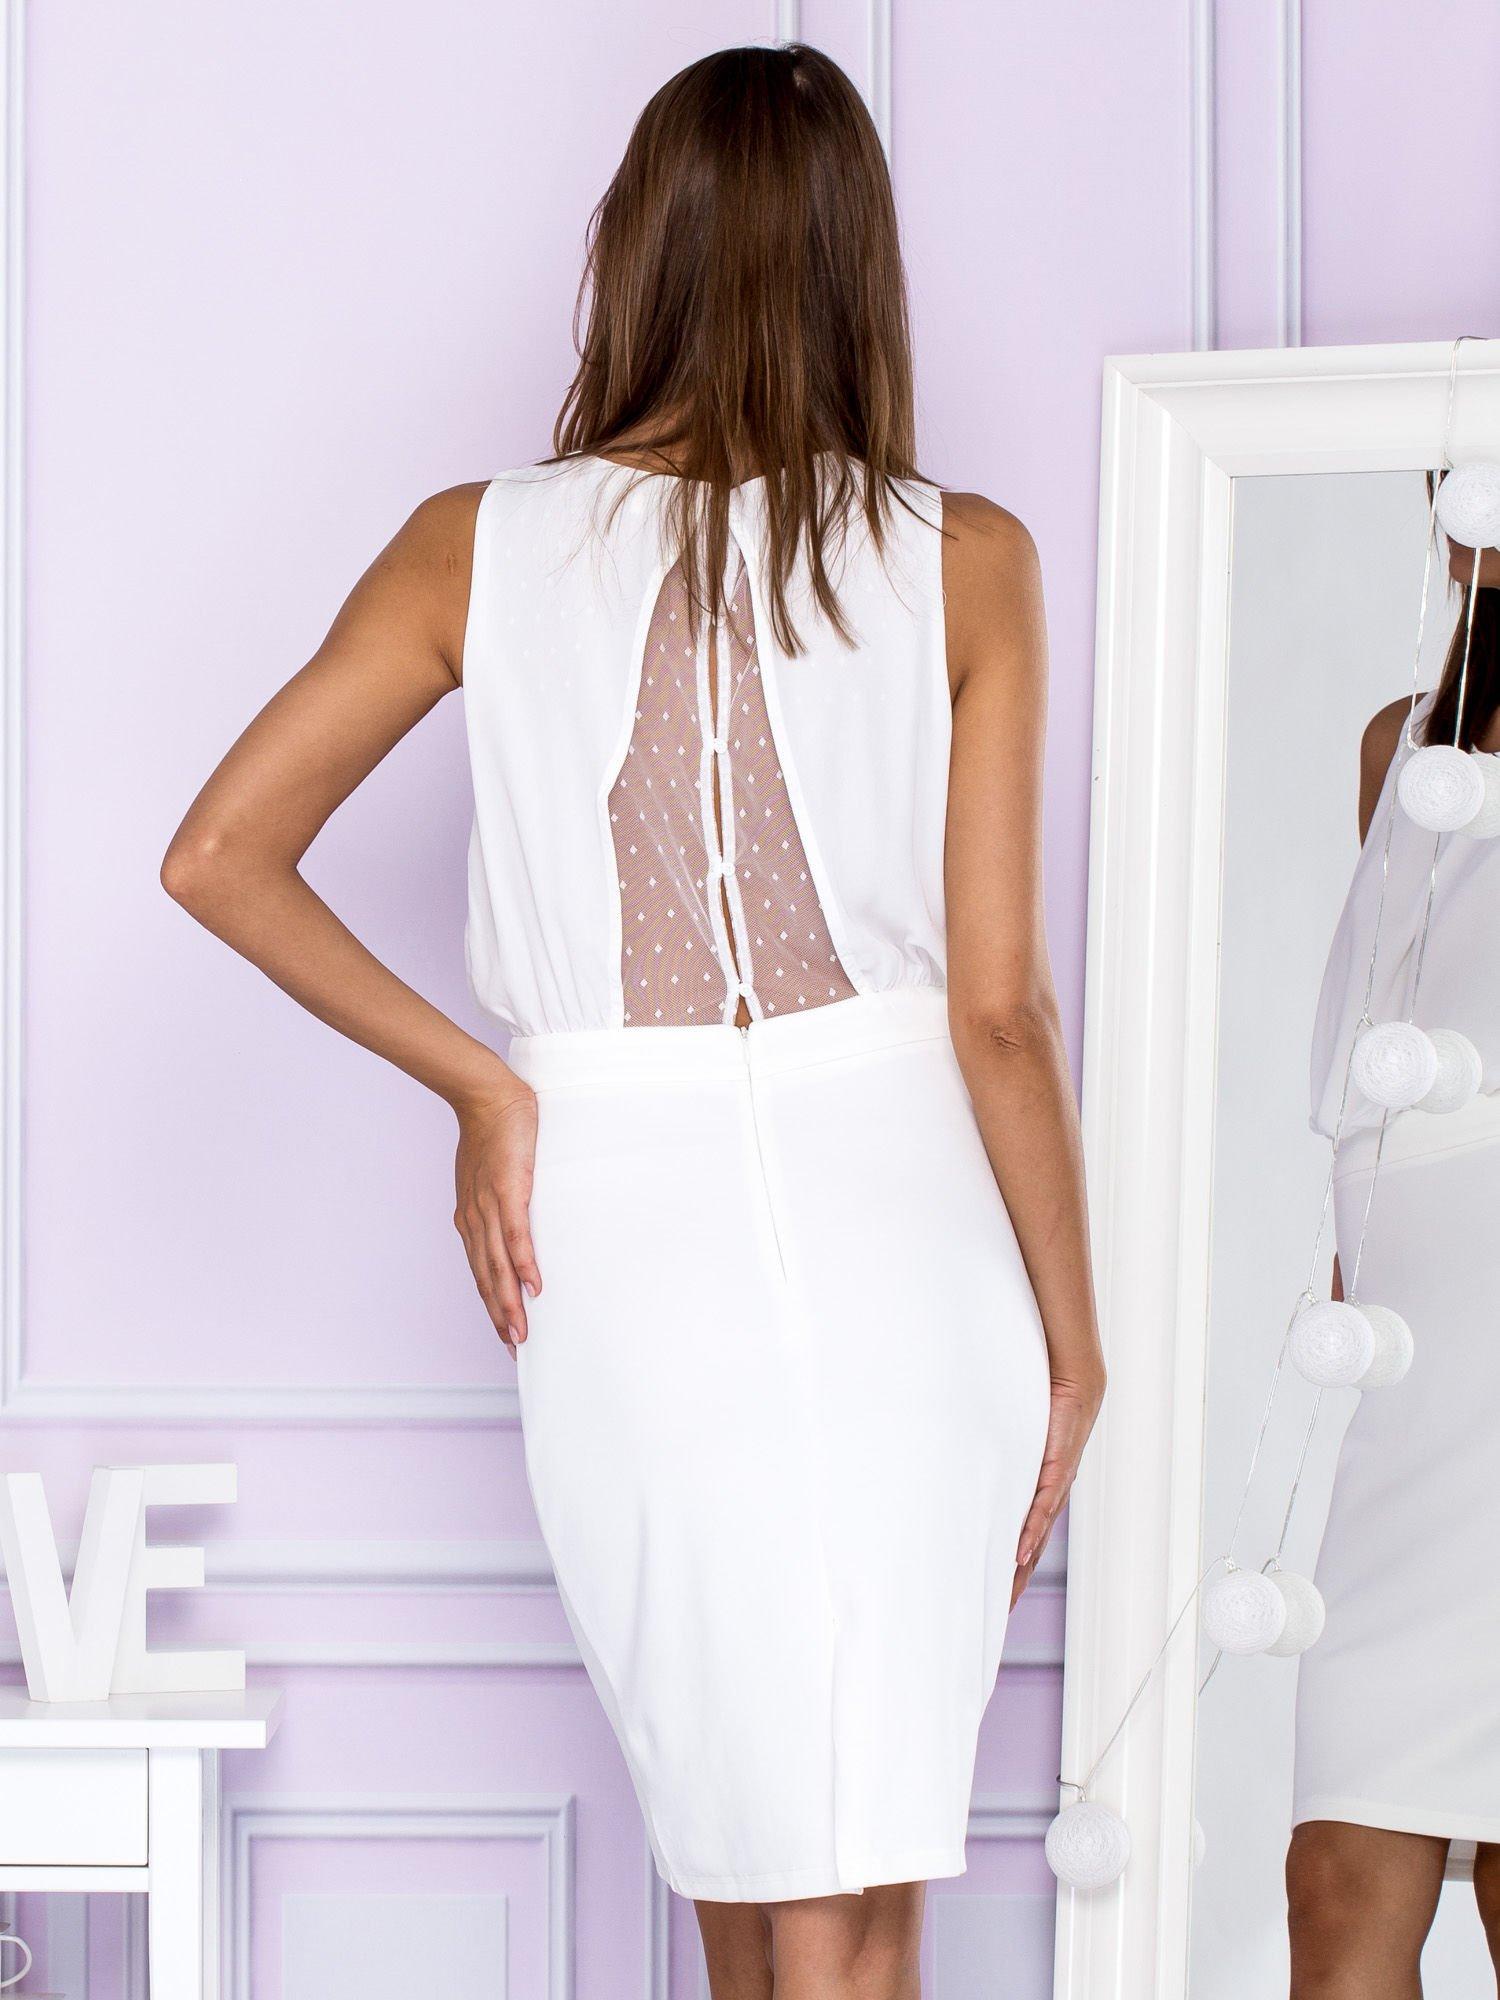 3f14041a5d Sukienka koktajlowa z biżuteryjnym dekoltem biała - Sukienka ...